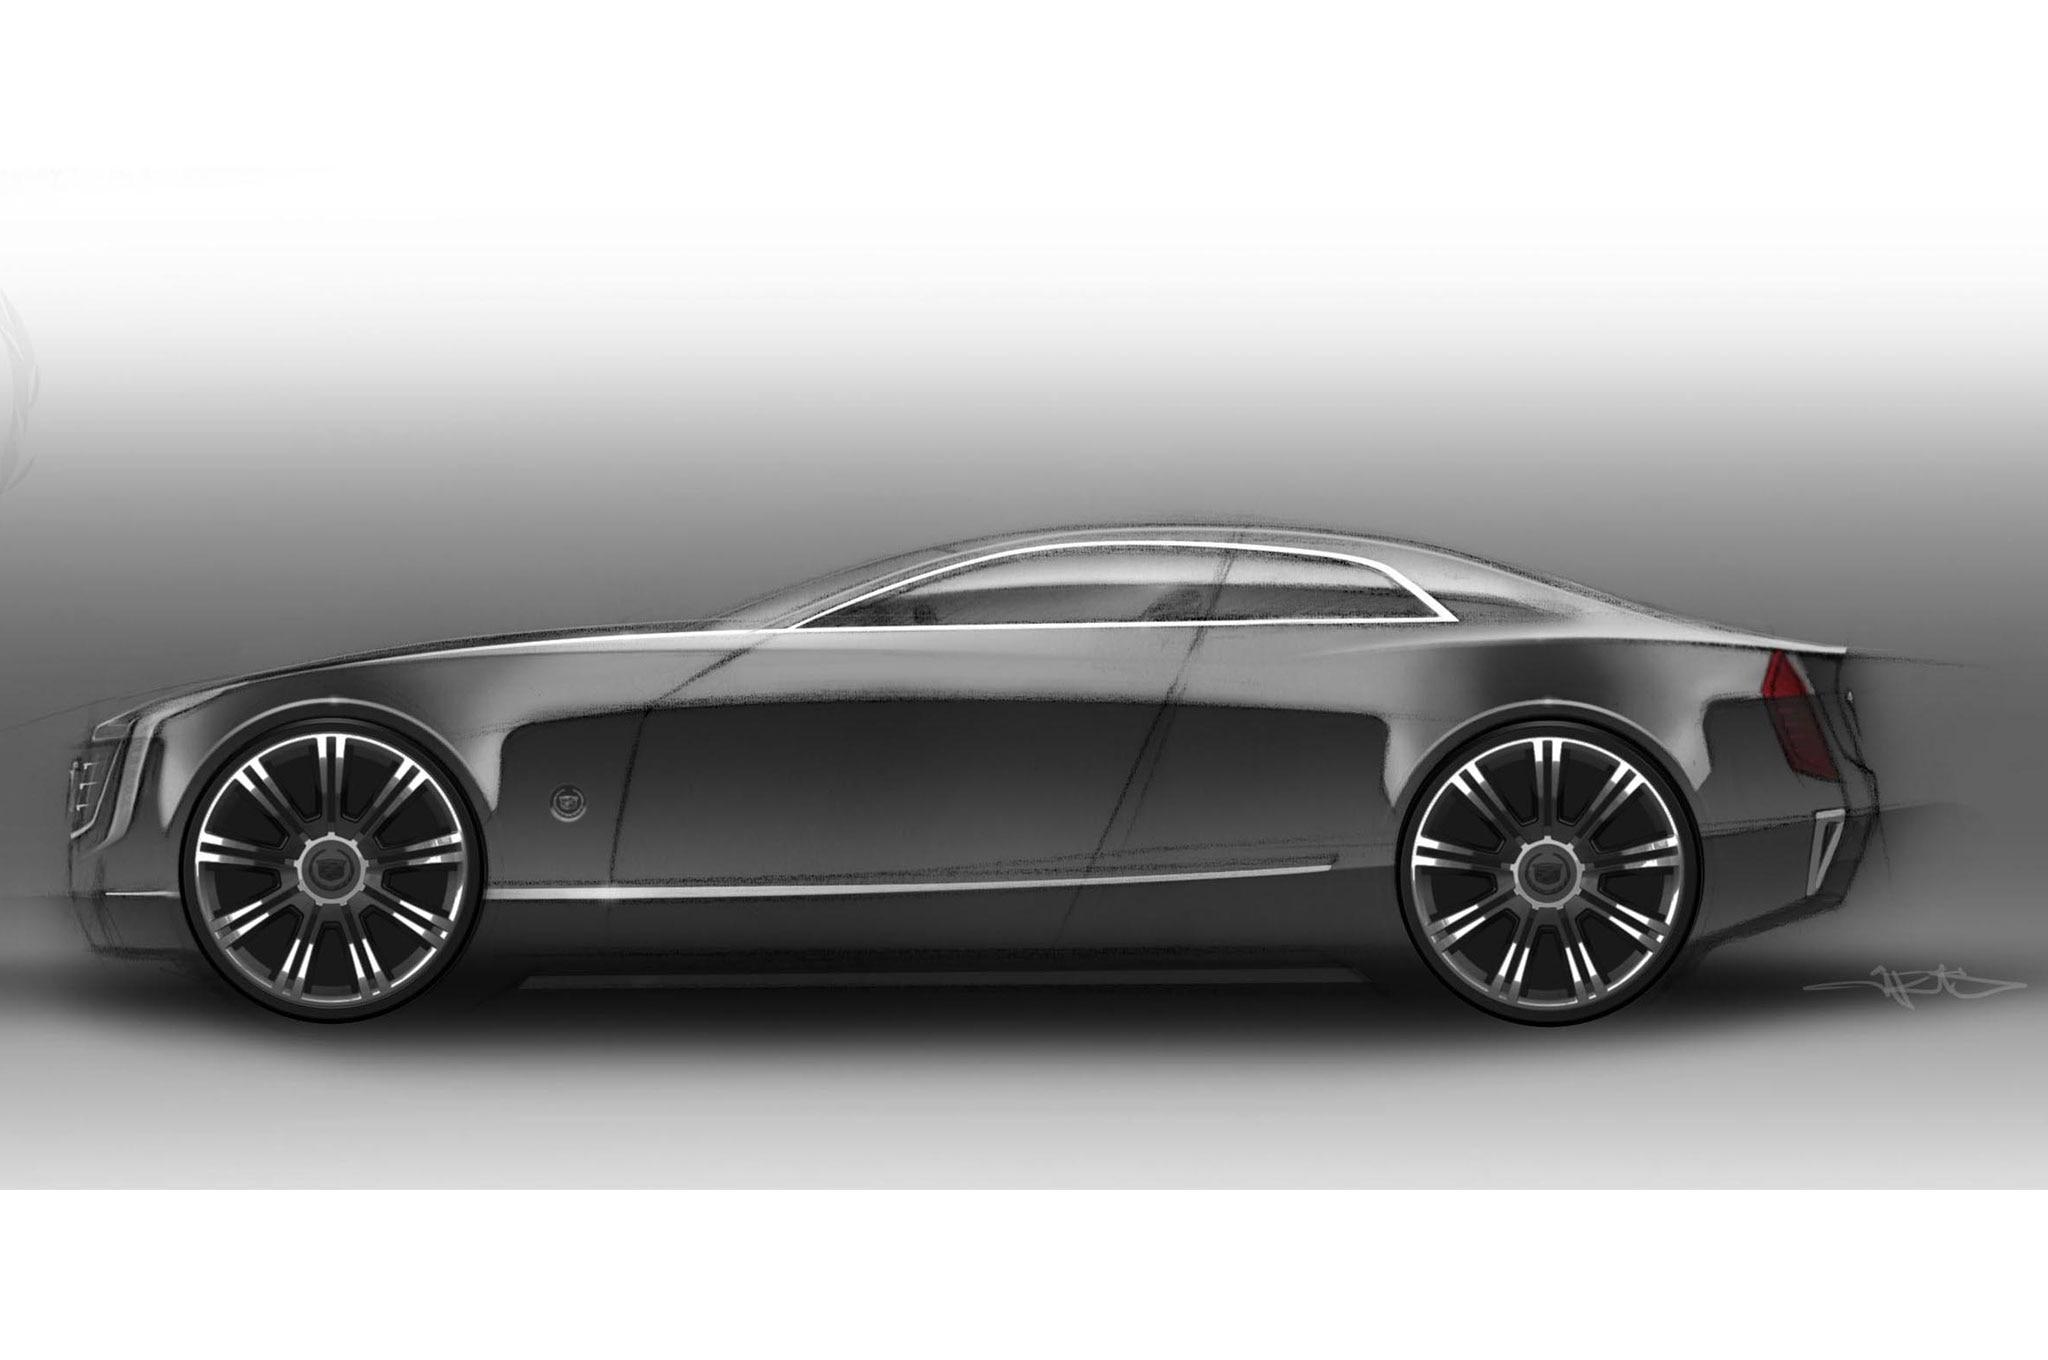 2013 Cadillac Elmiraj Concept Revealed at Pebble Beach Automobile